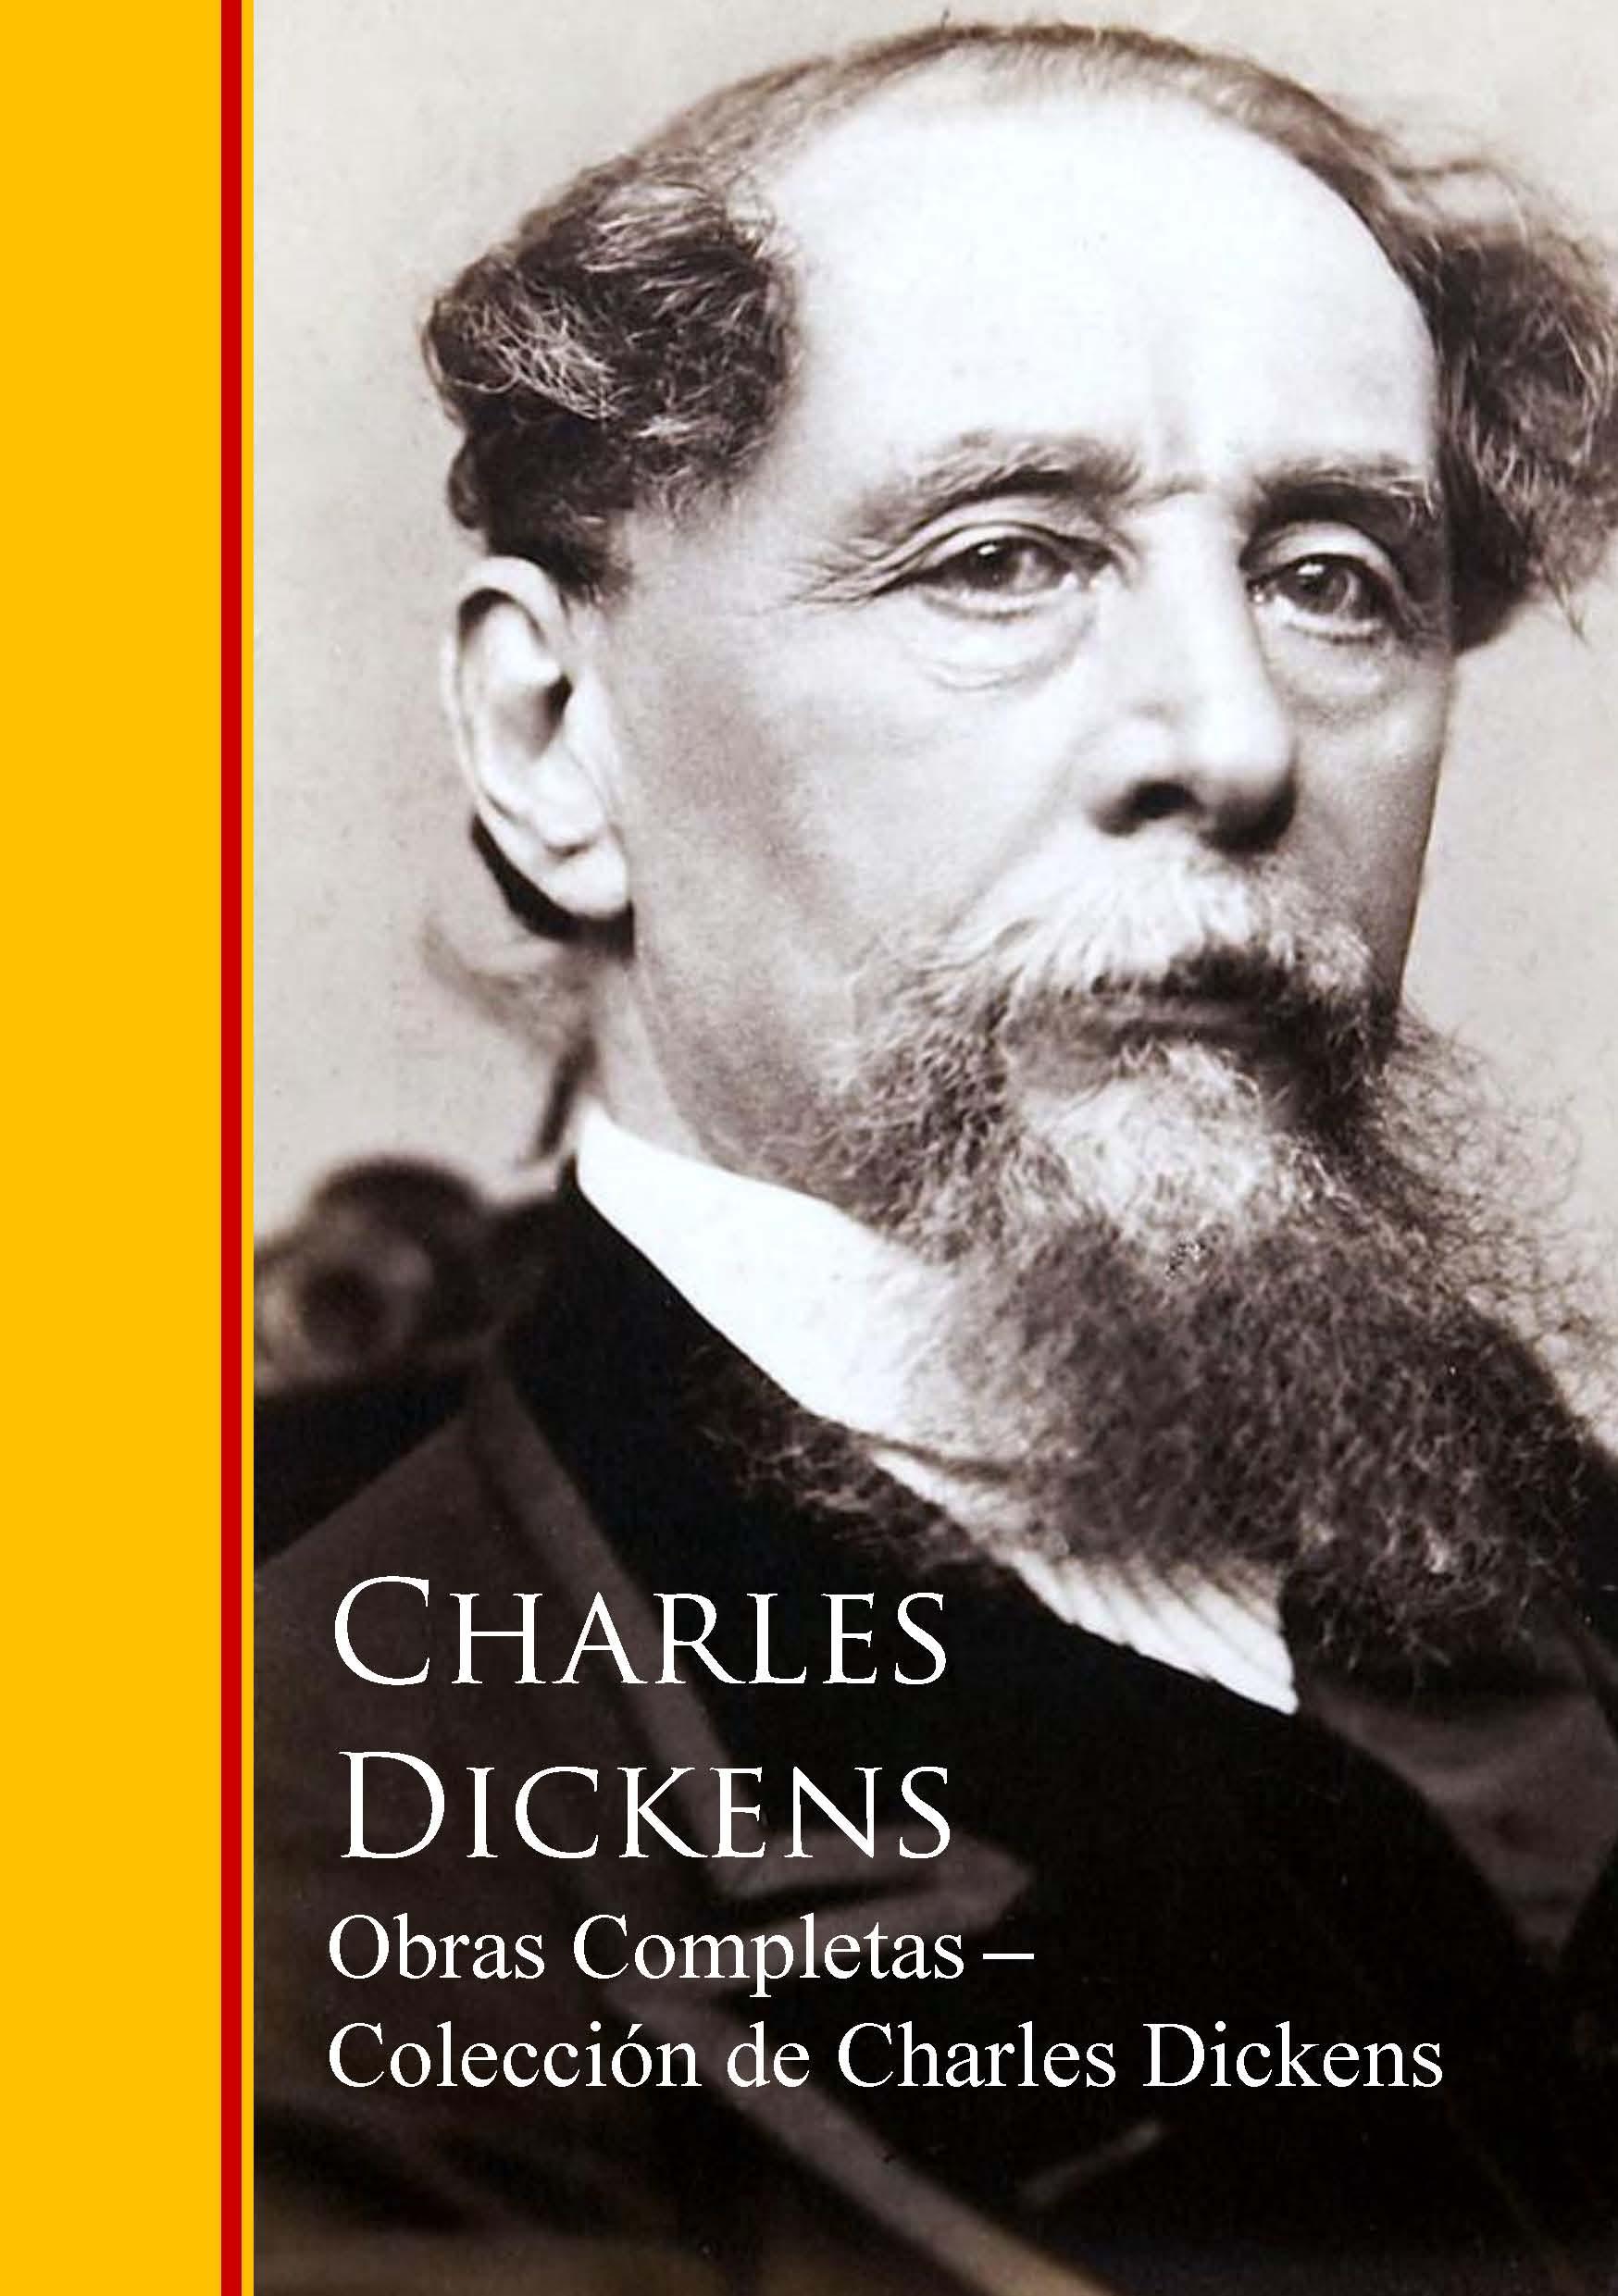 цена Чарльз Диккенс Obras Completas ─ Colección de Charles Dickens онлайн в 2017 году